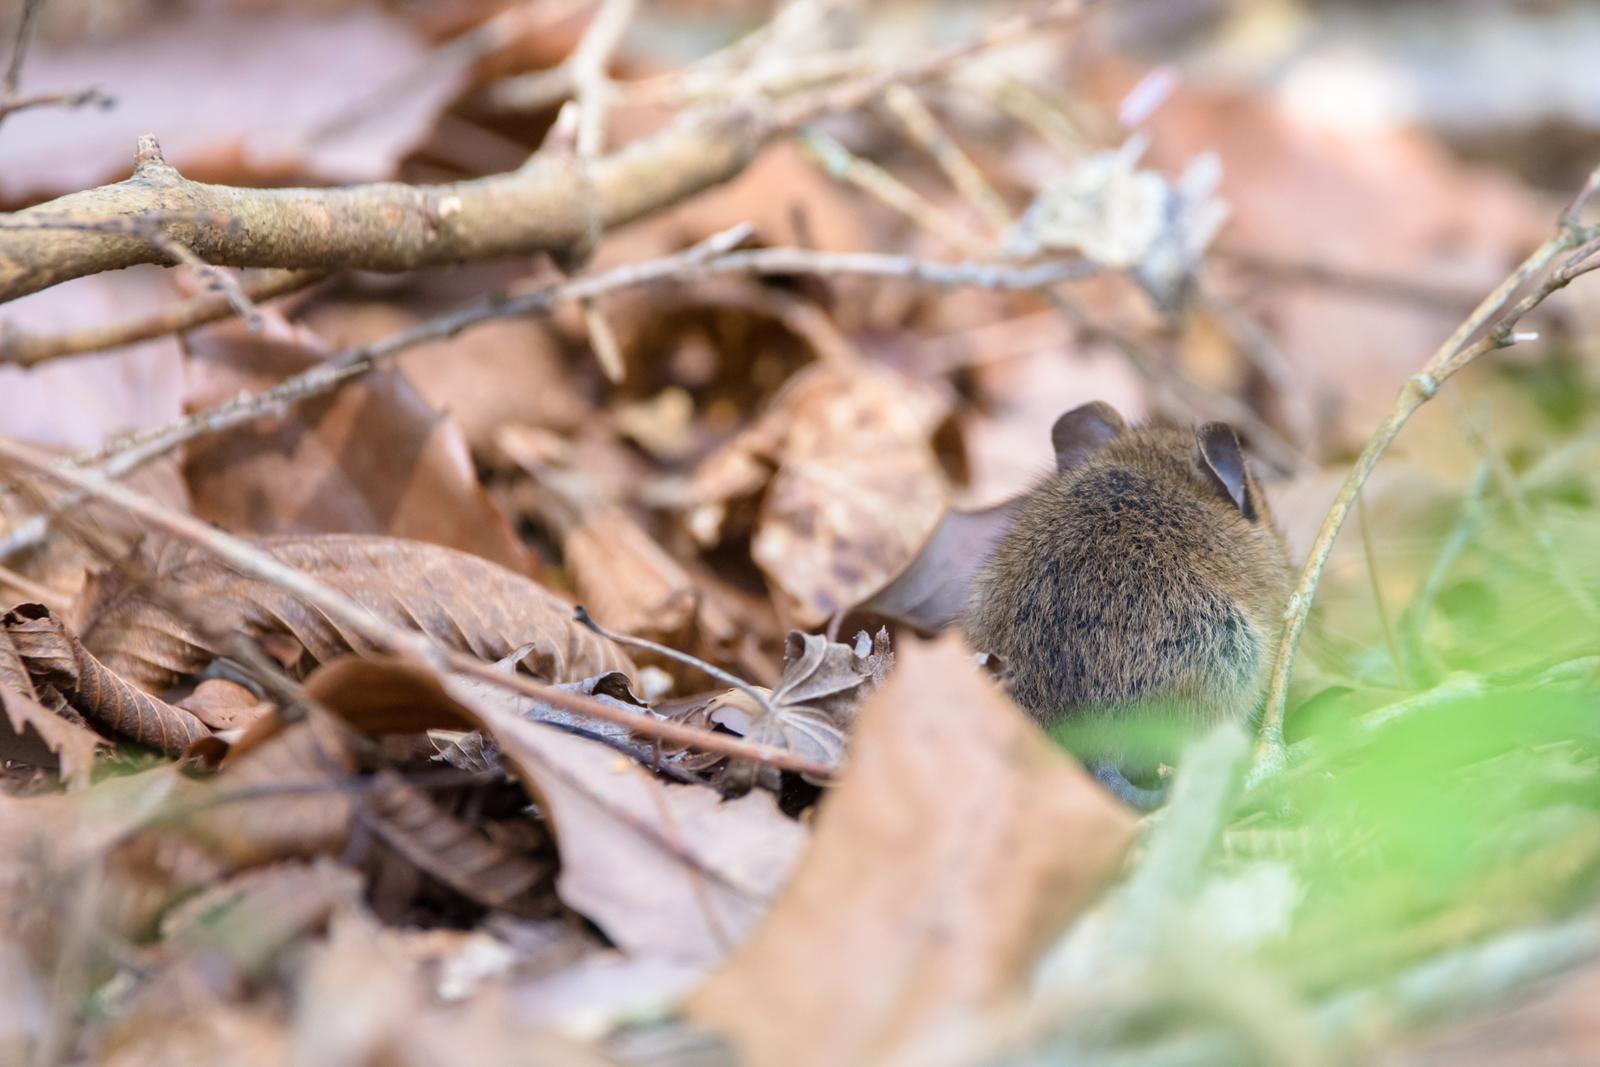 Photo: 「大きな森の中の小さな耳」 / Small ear in the forest.  じっと静かに 耳を傾ける 木々たちの声を いきものたちの声を その小さな小さな耳で  Small Japanese field mouse. (ヒメネズミ)  Nikon D7200 SIGMA 150-600mm F5-6.3 DG OS HSM Contemporary  #animal #mouse #kawaii #動物 #ねずみ #nikon #sigma  ( http://takafumiooshio.com/archives/2458 )